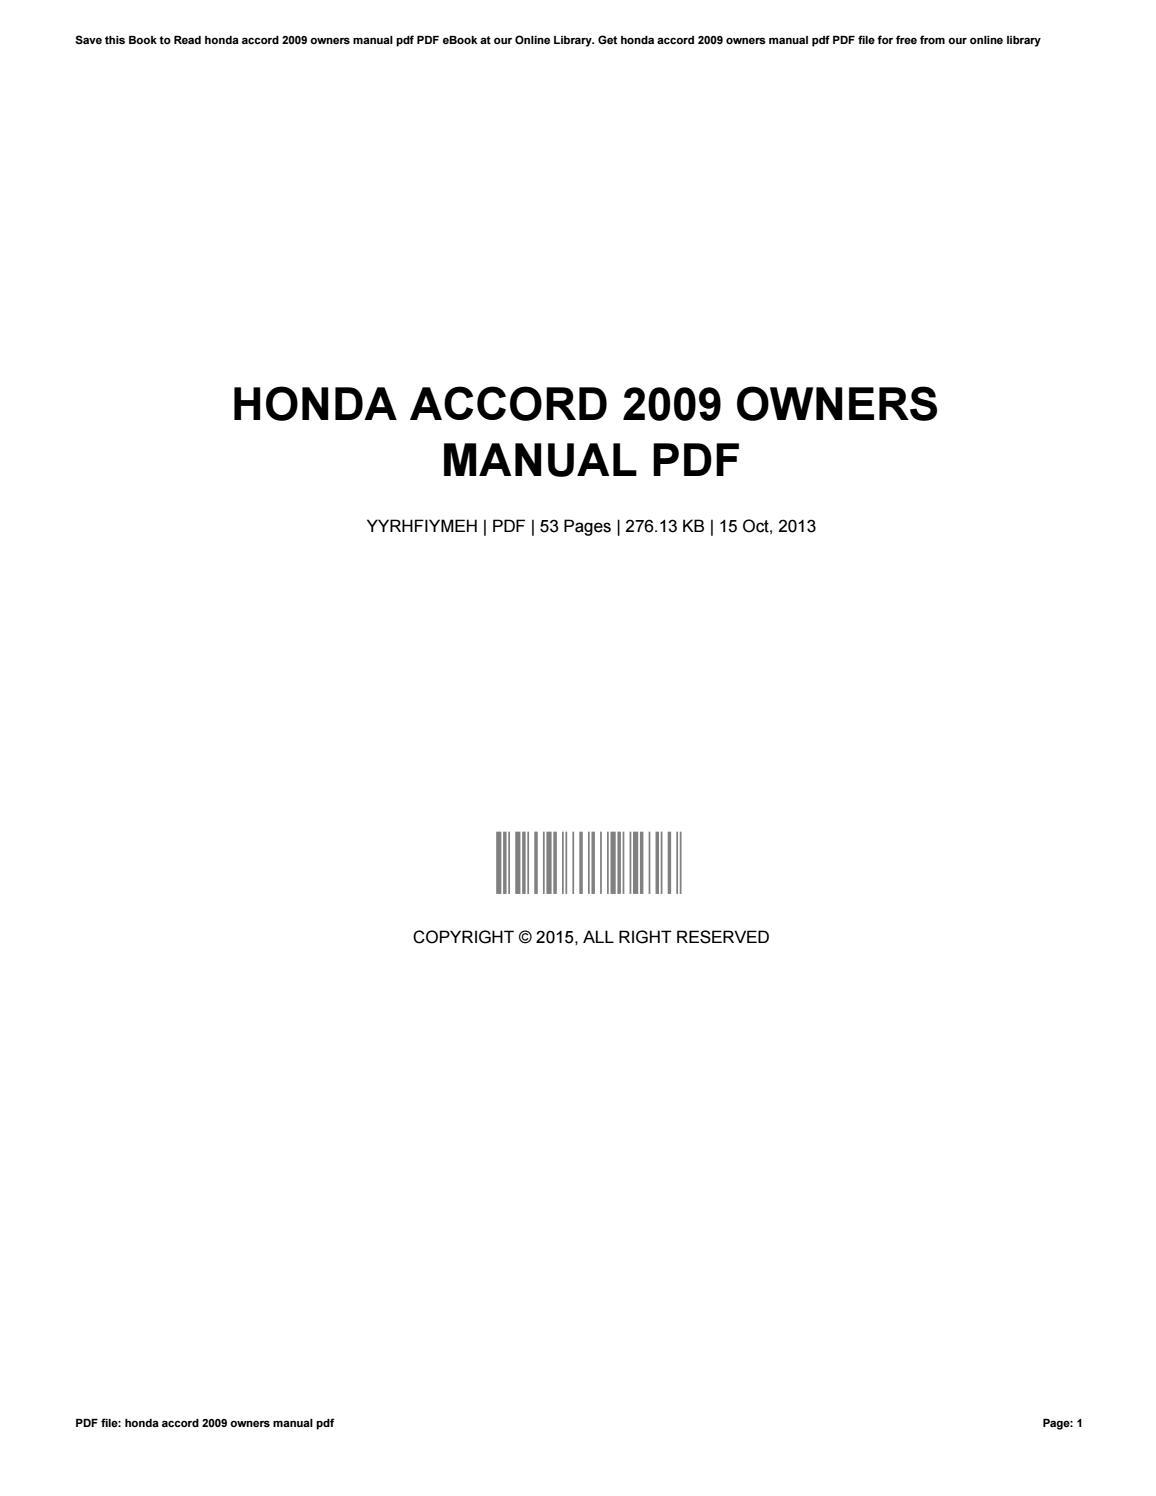 honda accord owners manual pdf